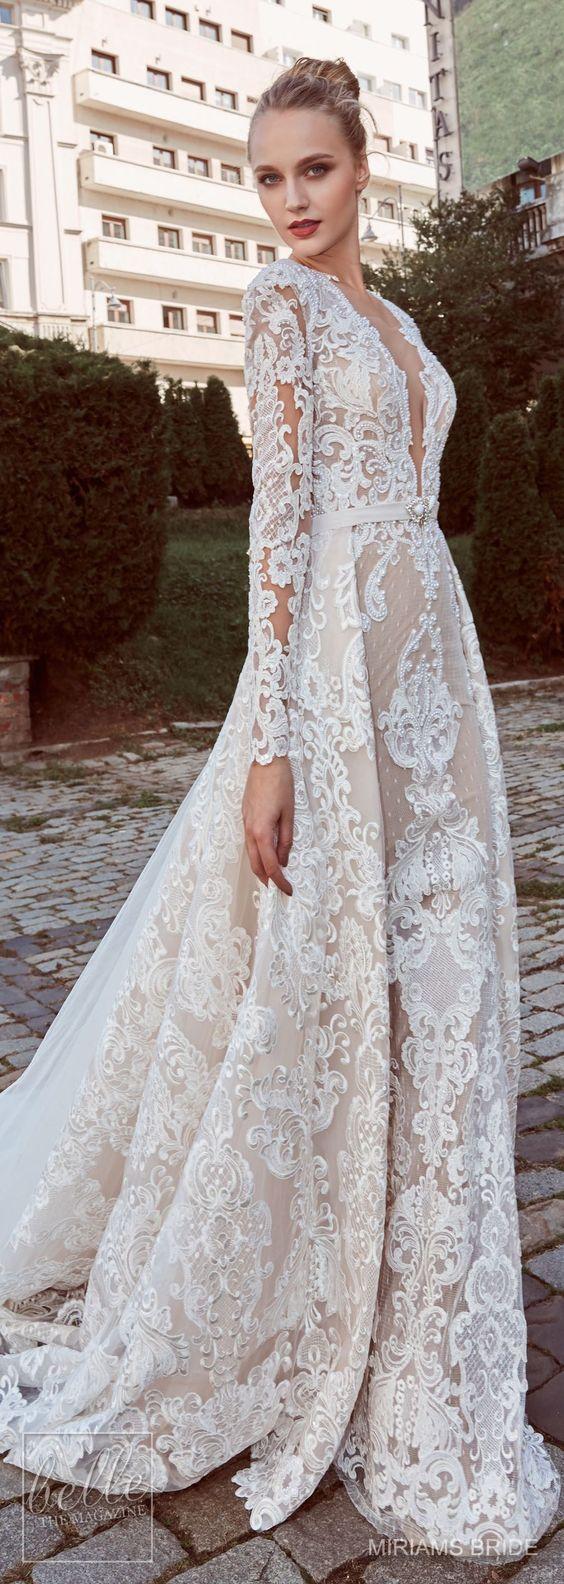 Wedding Dresses by Miriams Bride 2018